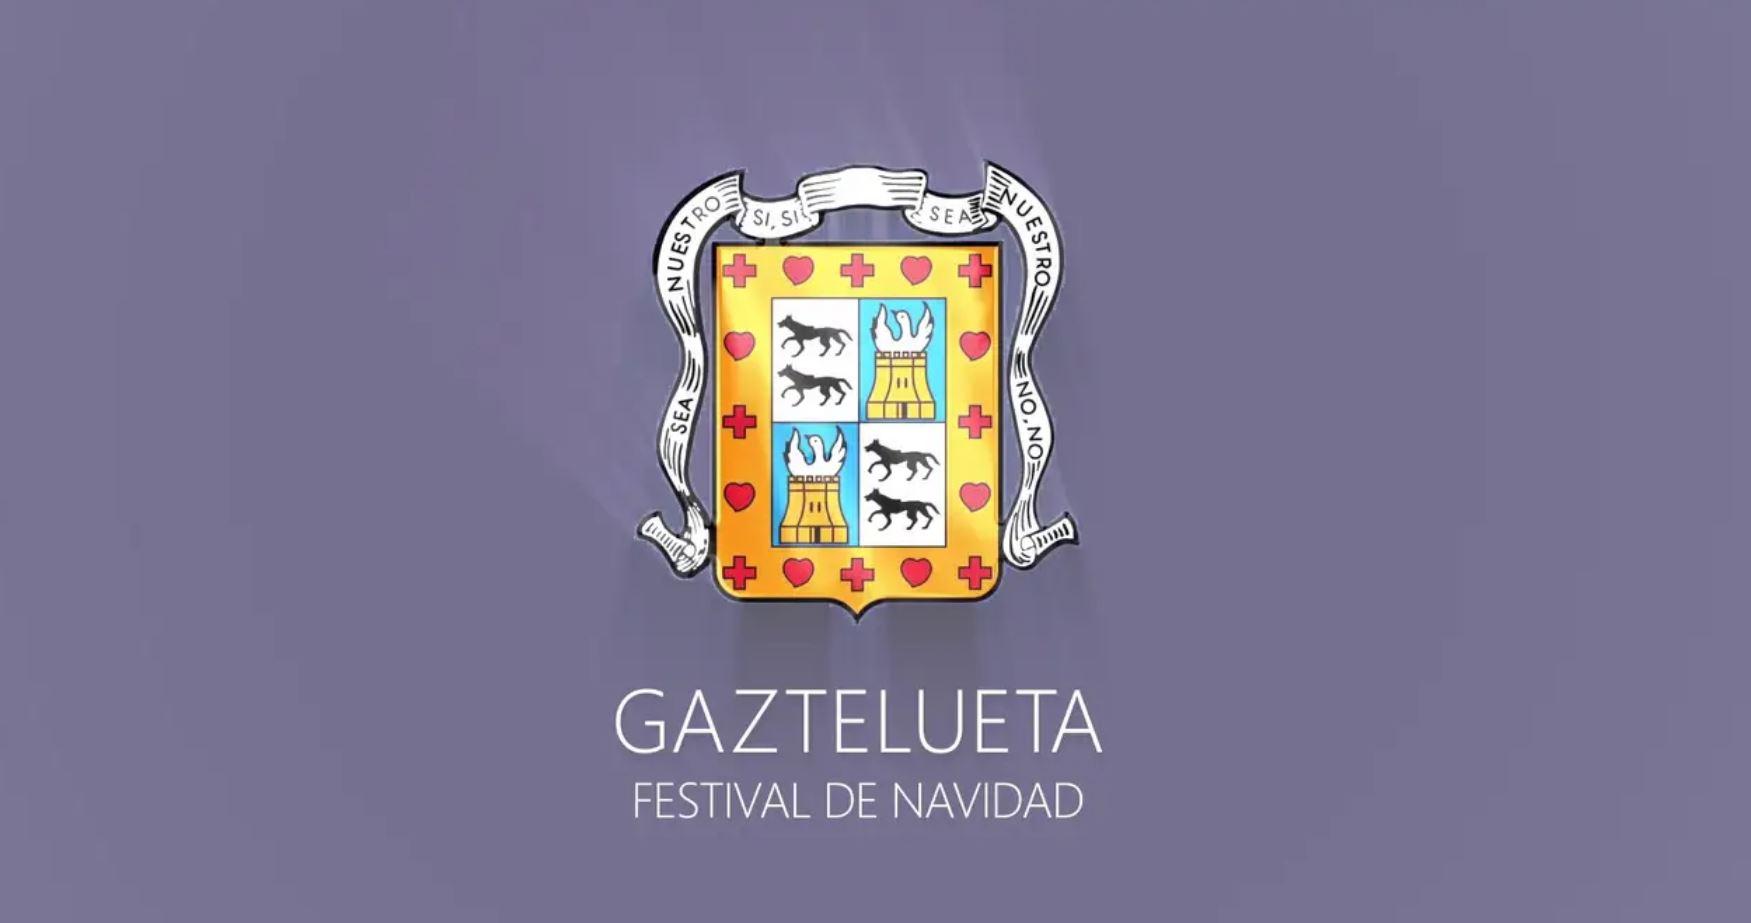 Festival de Navidad de Gaztelueta